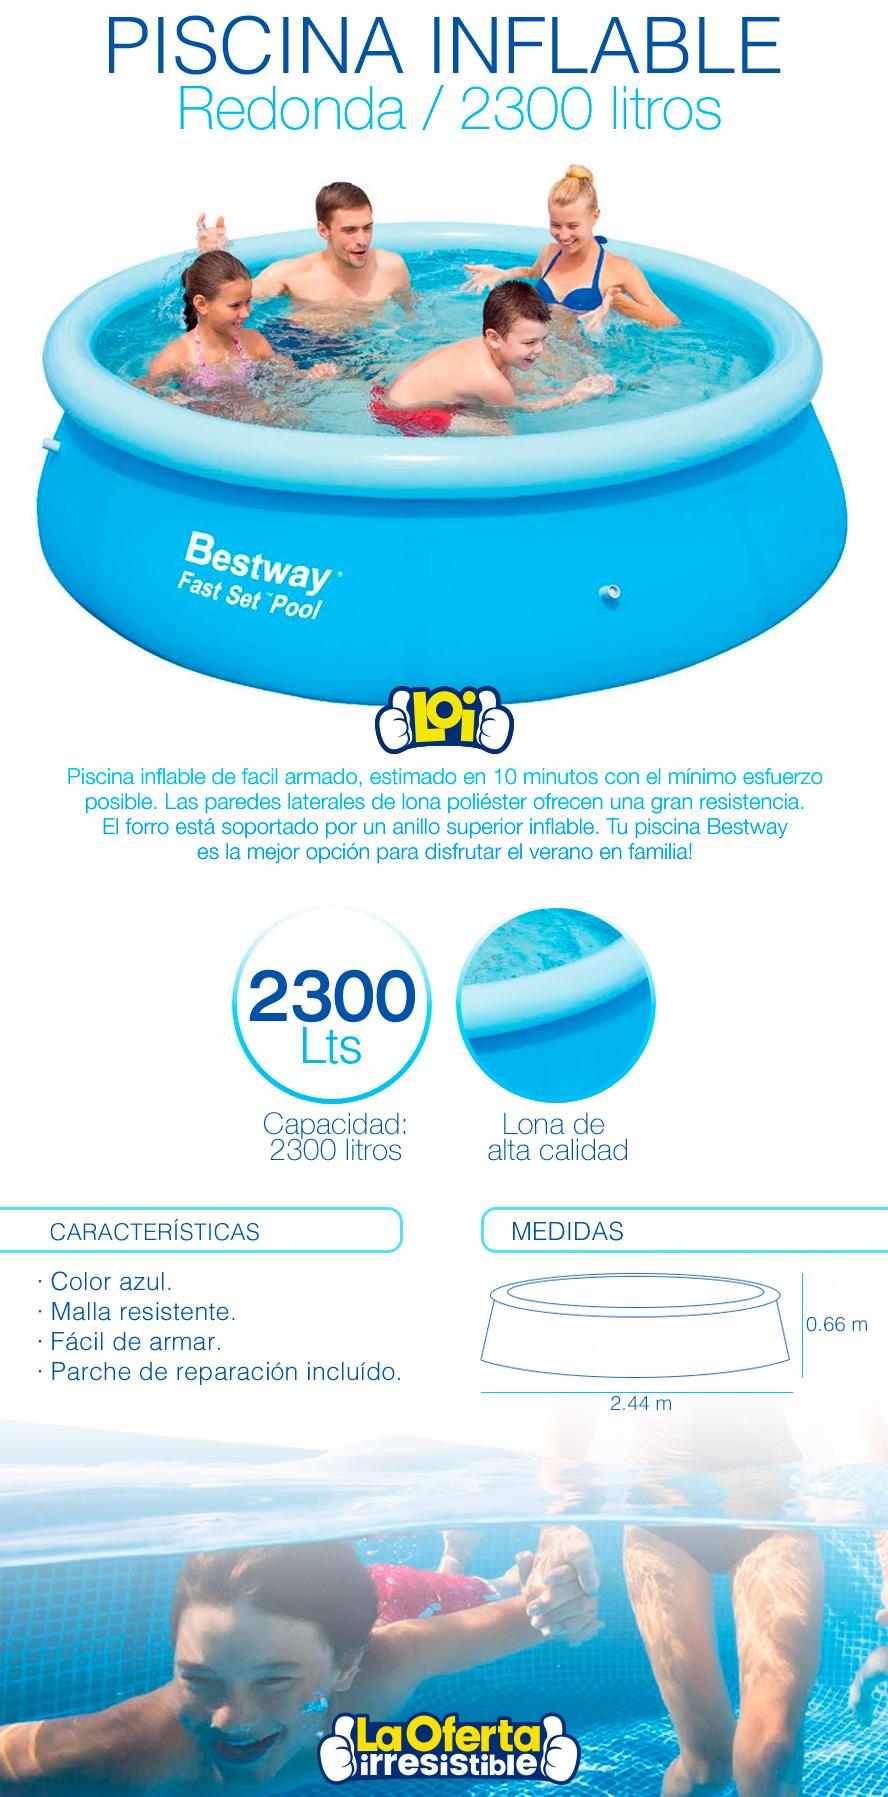 Piscina redonda inflable de 2300 litros oferta loi - Parches para piscinas desmontables ...